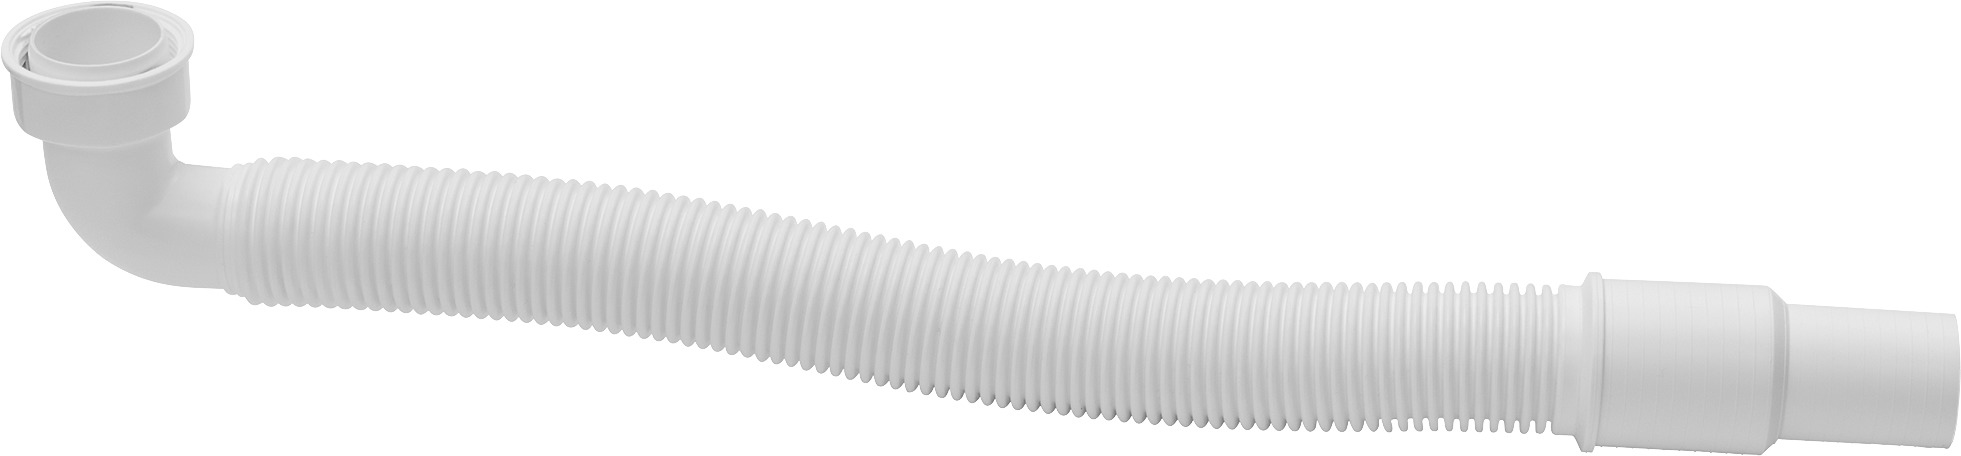 Anschlußschlauch flex 11/2x40/50 (415) Bild 1